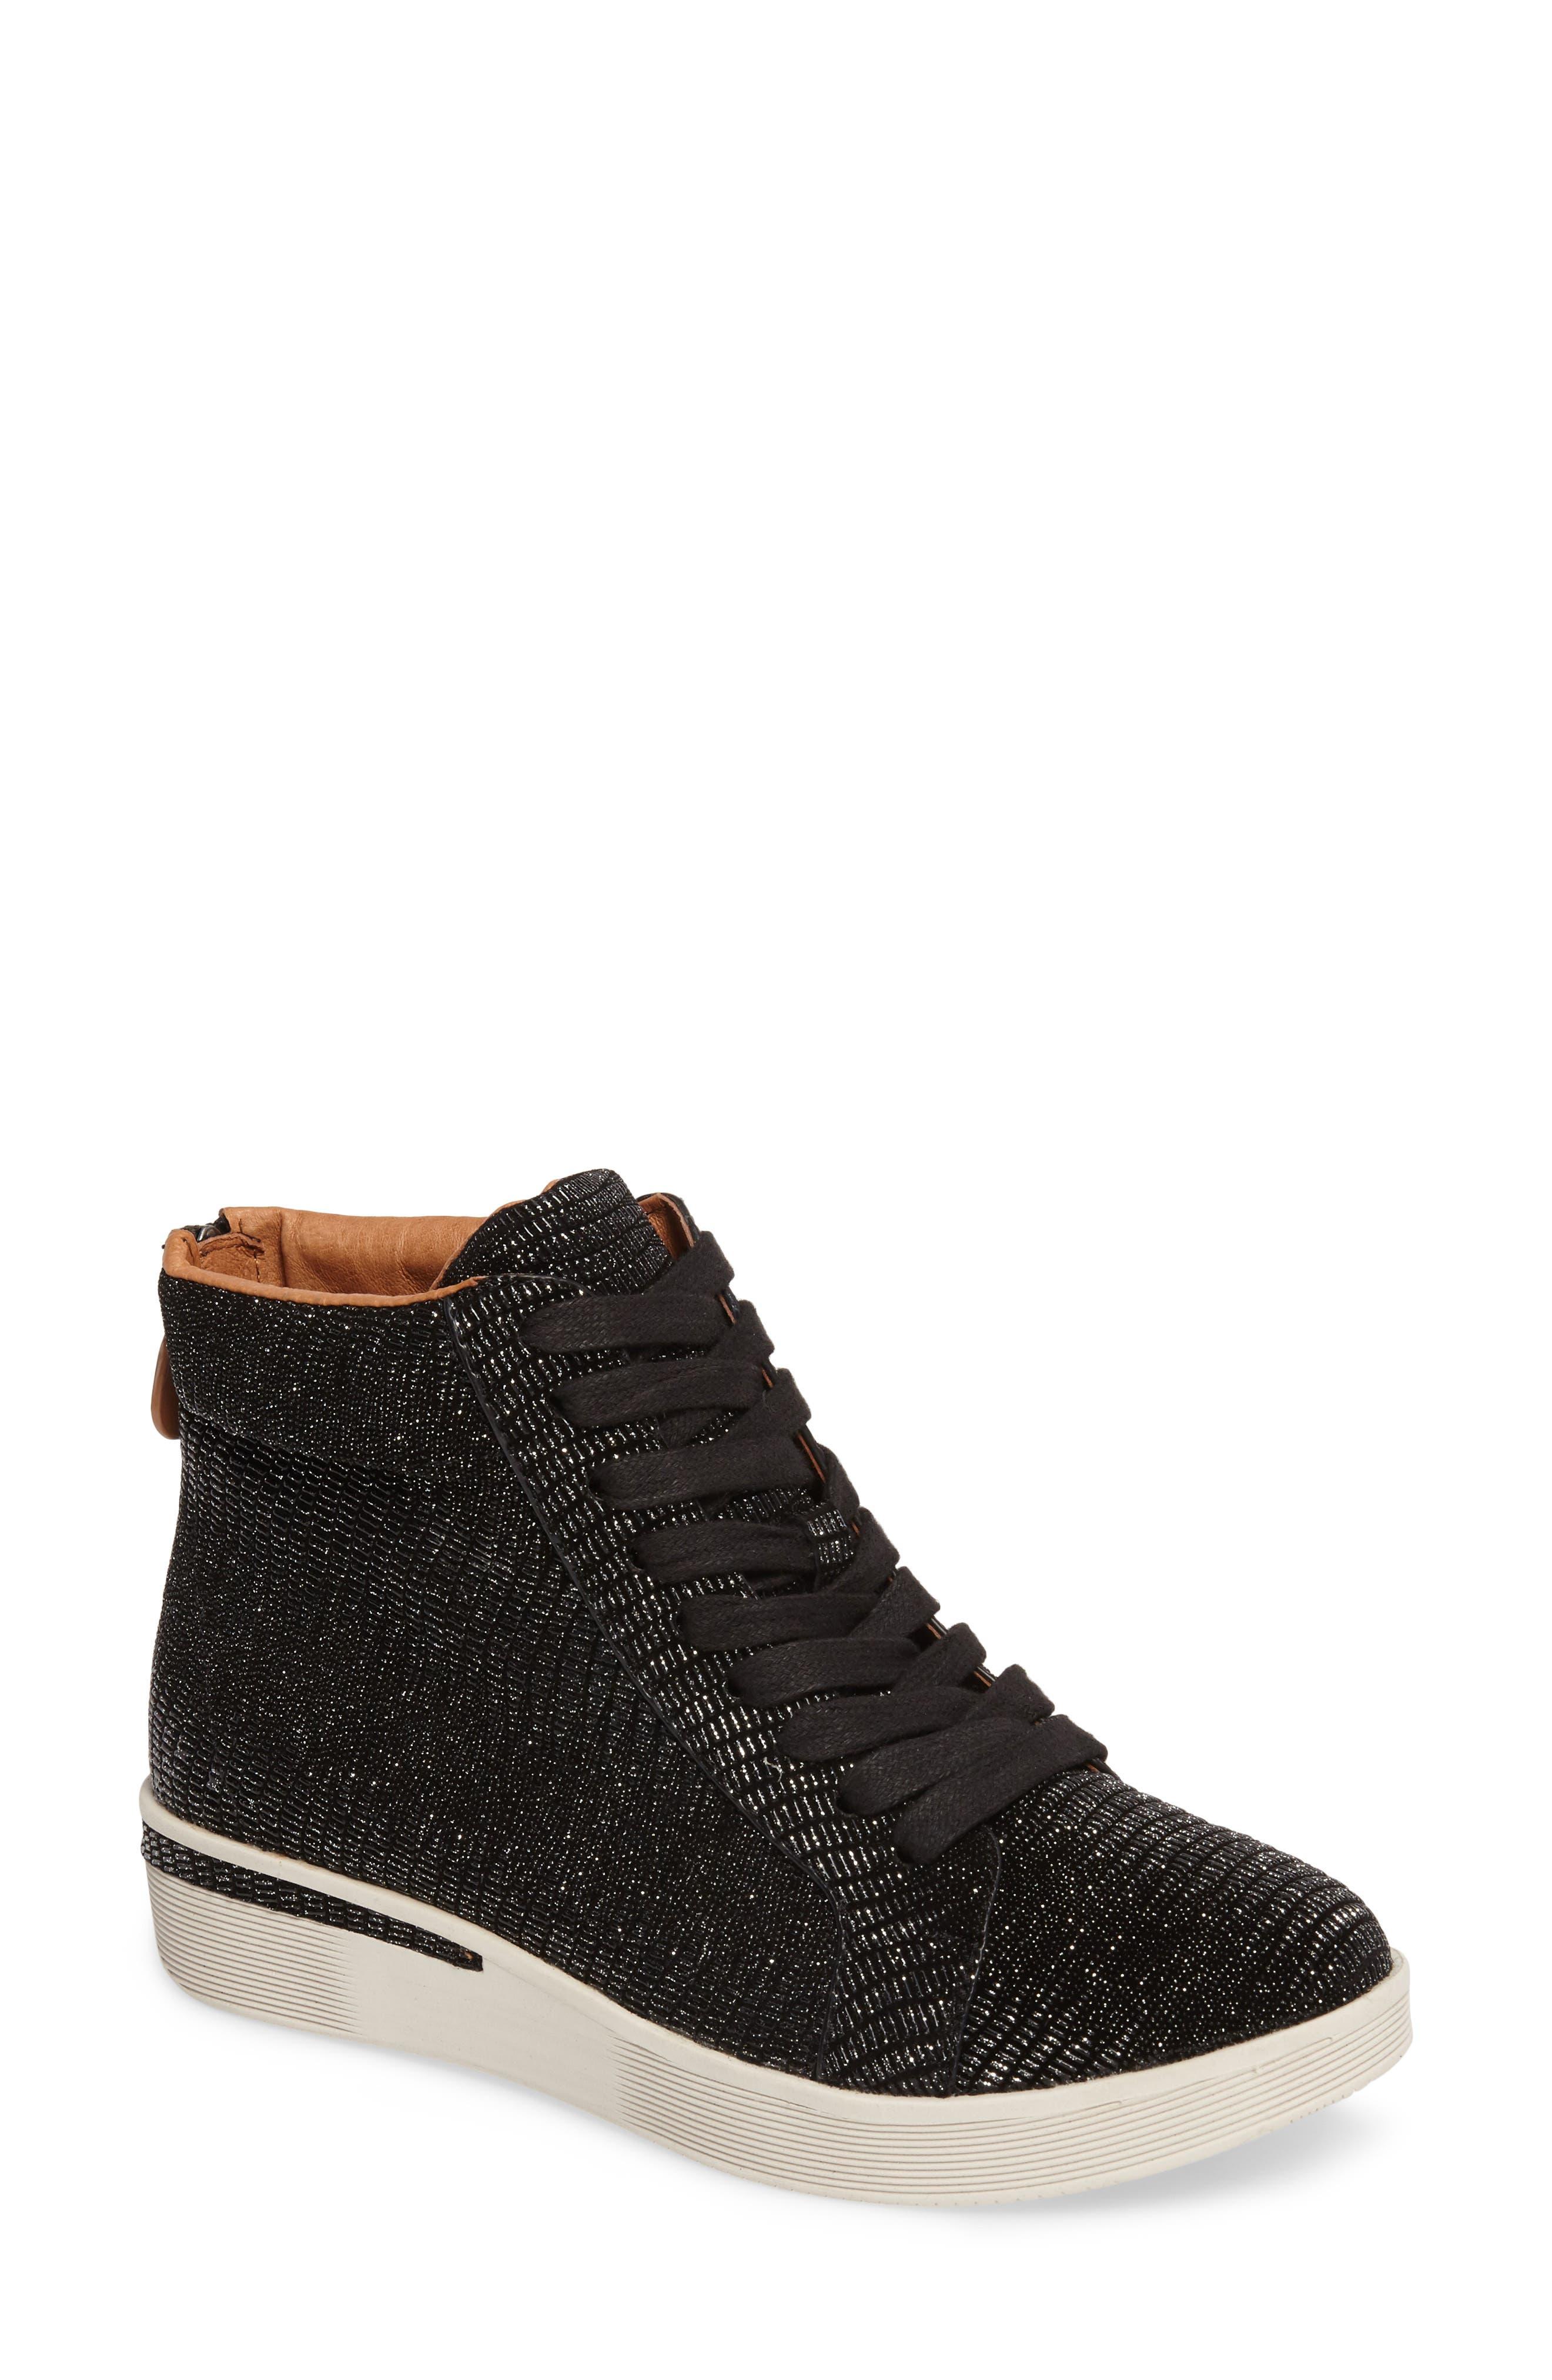 Helka High Top Sneaker,                             Main thumbnail 1, color,                             001